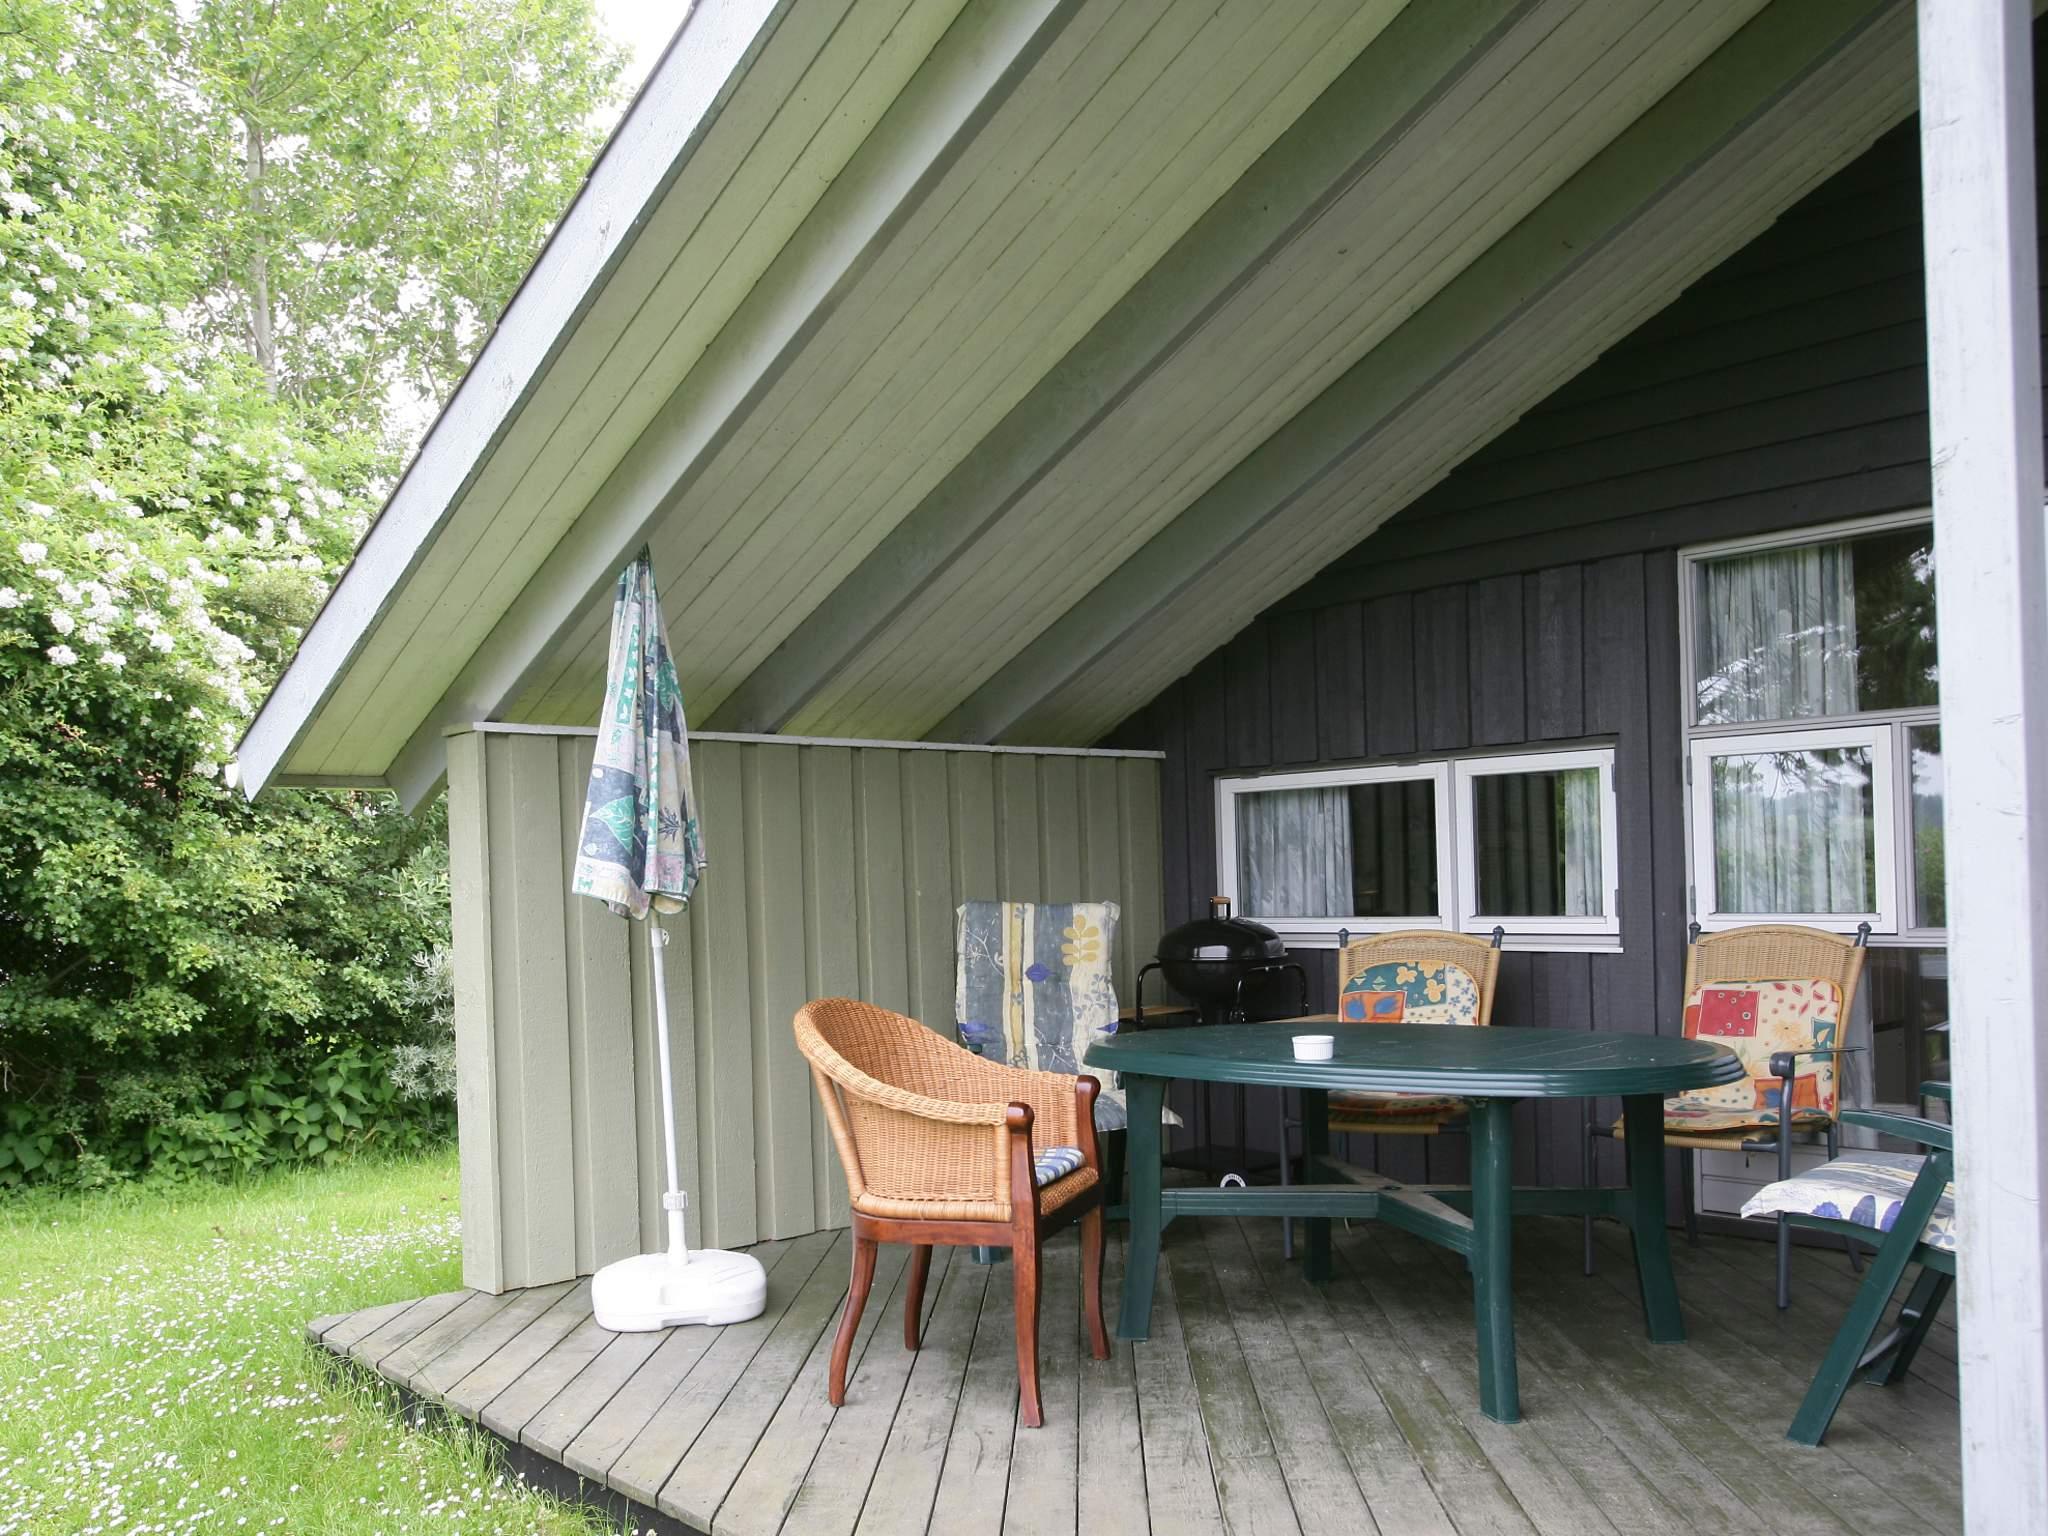 Ferienhaus Ristinge (93203), Ristinge, , Langeland, Dänemark, Bild 32